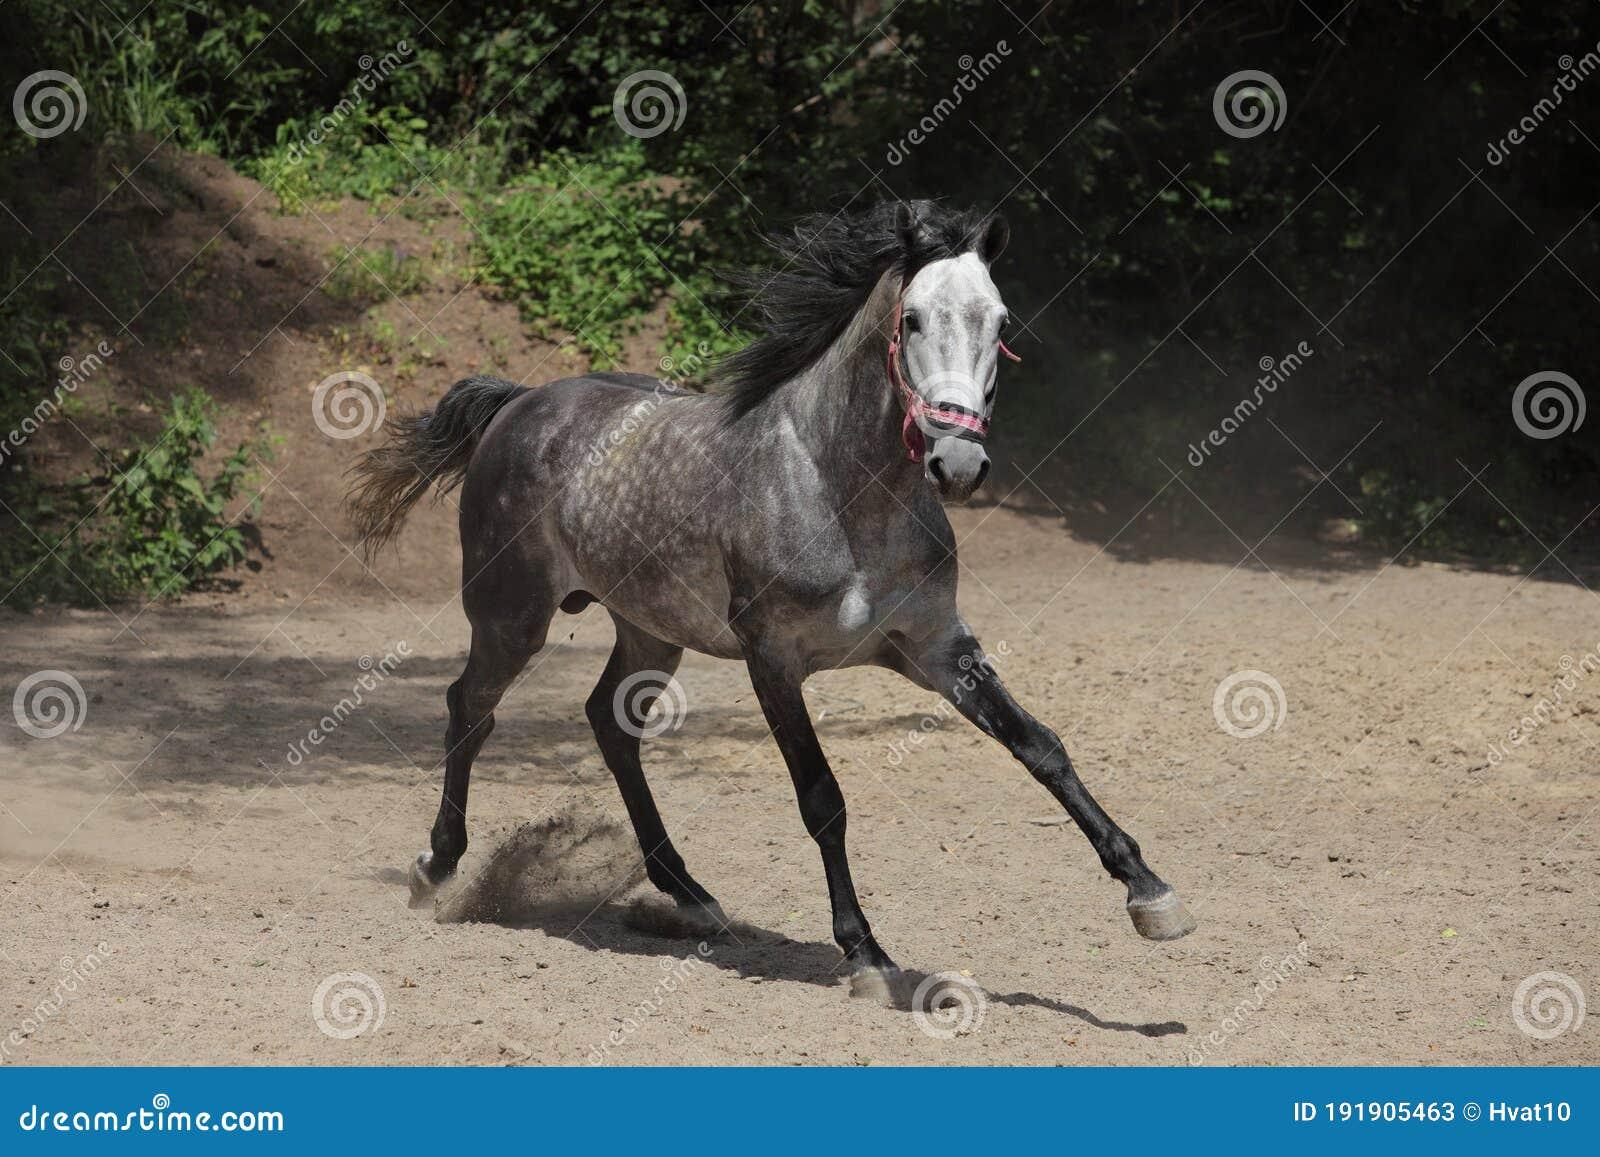 177 Dapple Grey Horse Arabian Photos Free Royalty Free Stock Photos From Dreamstime